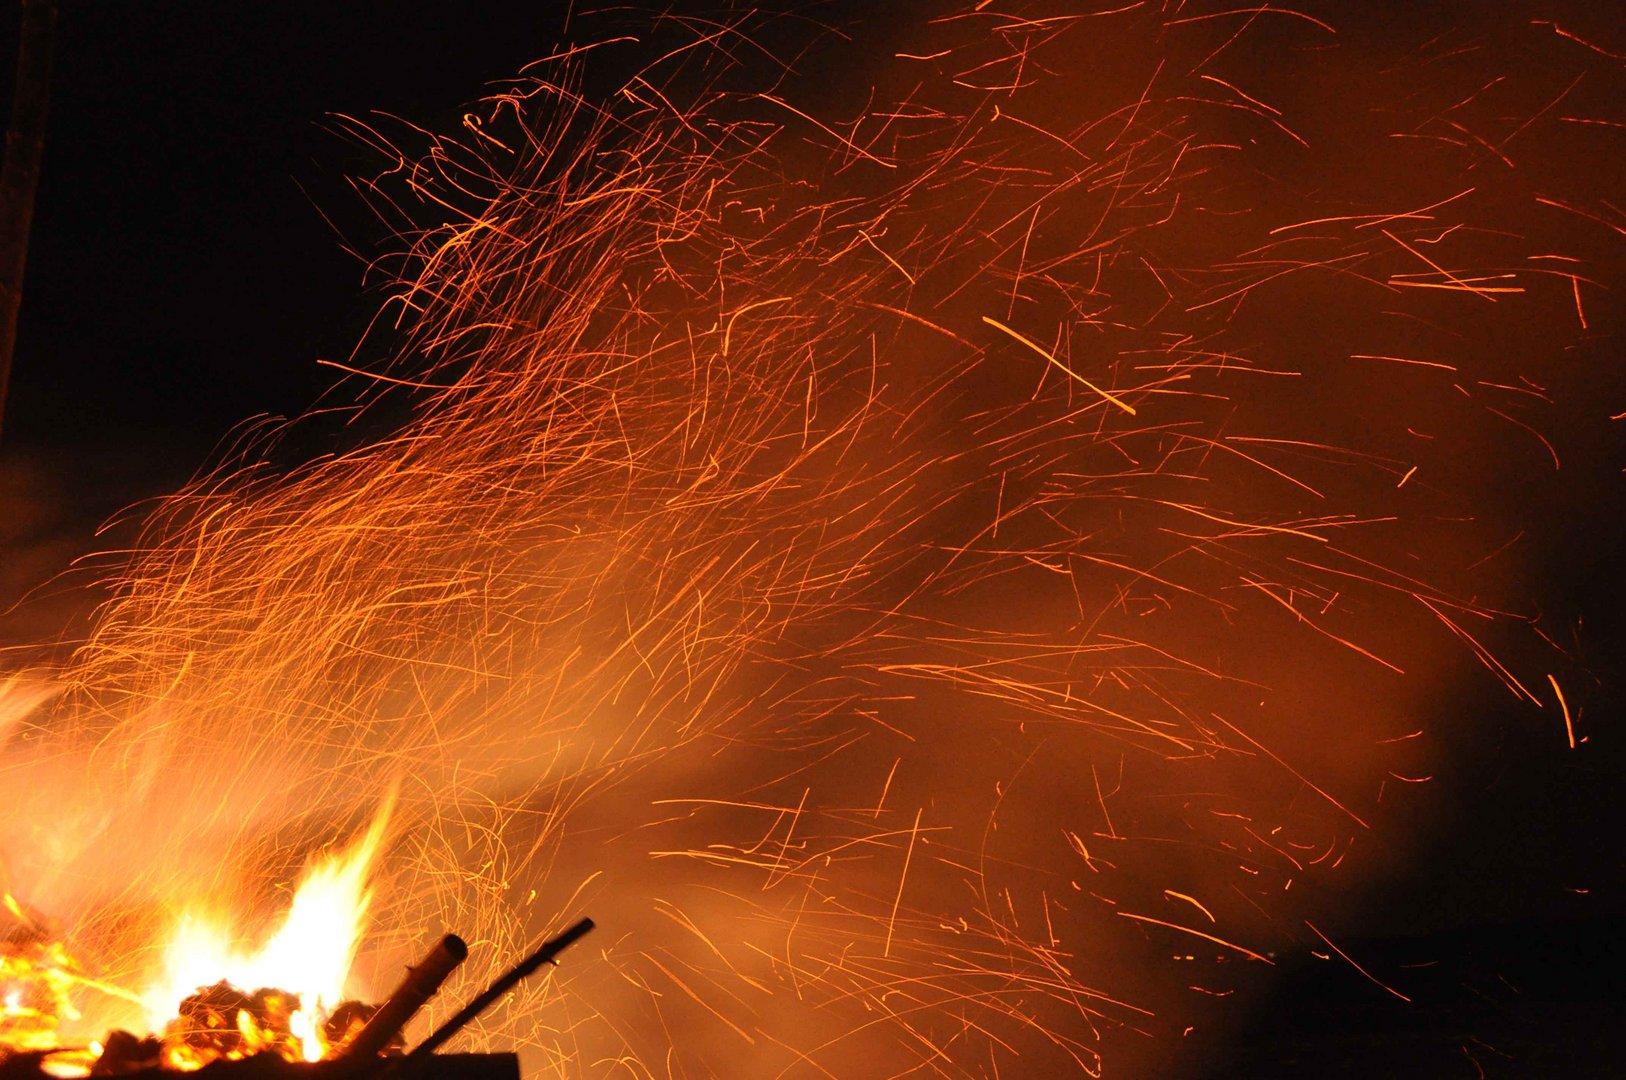 Funkenfeuer